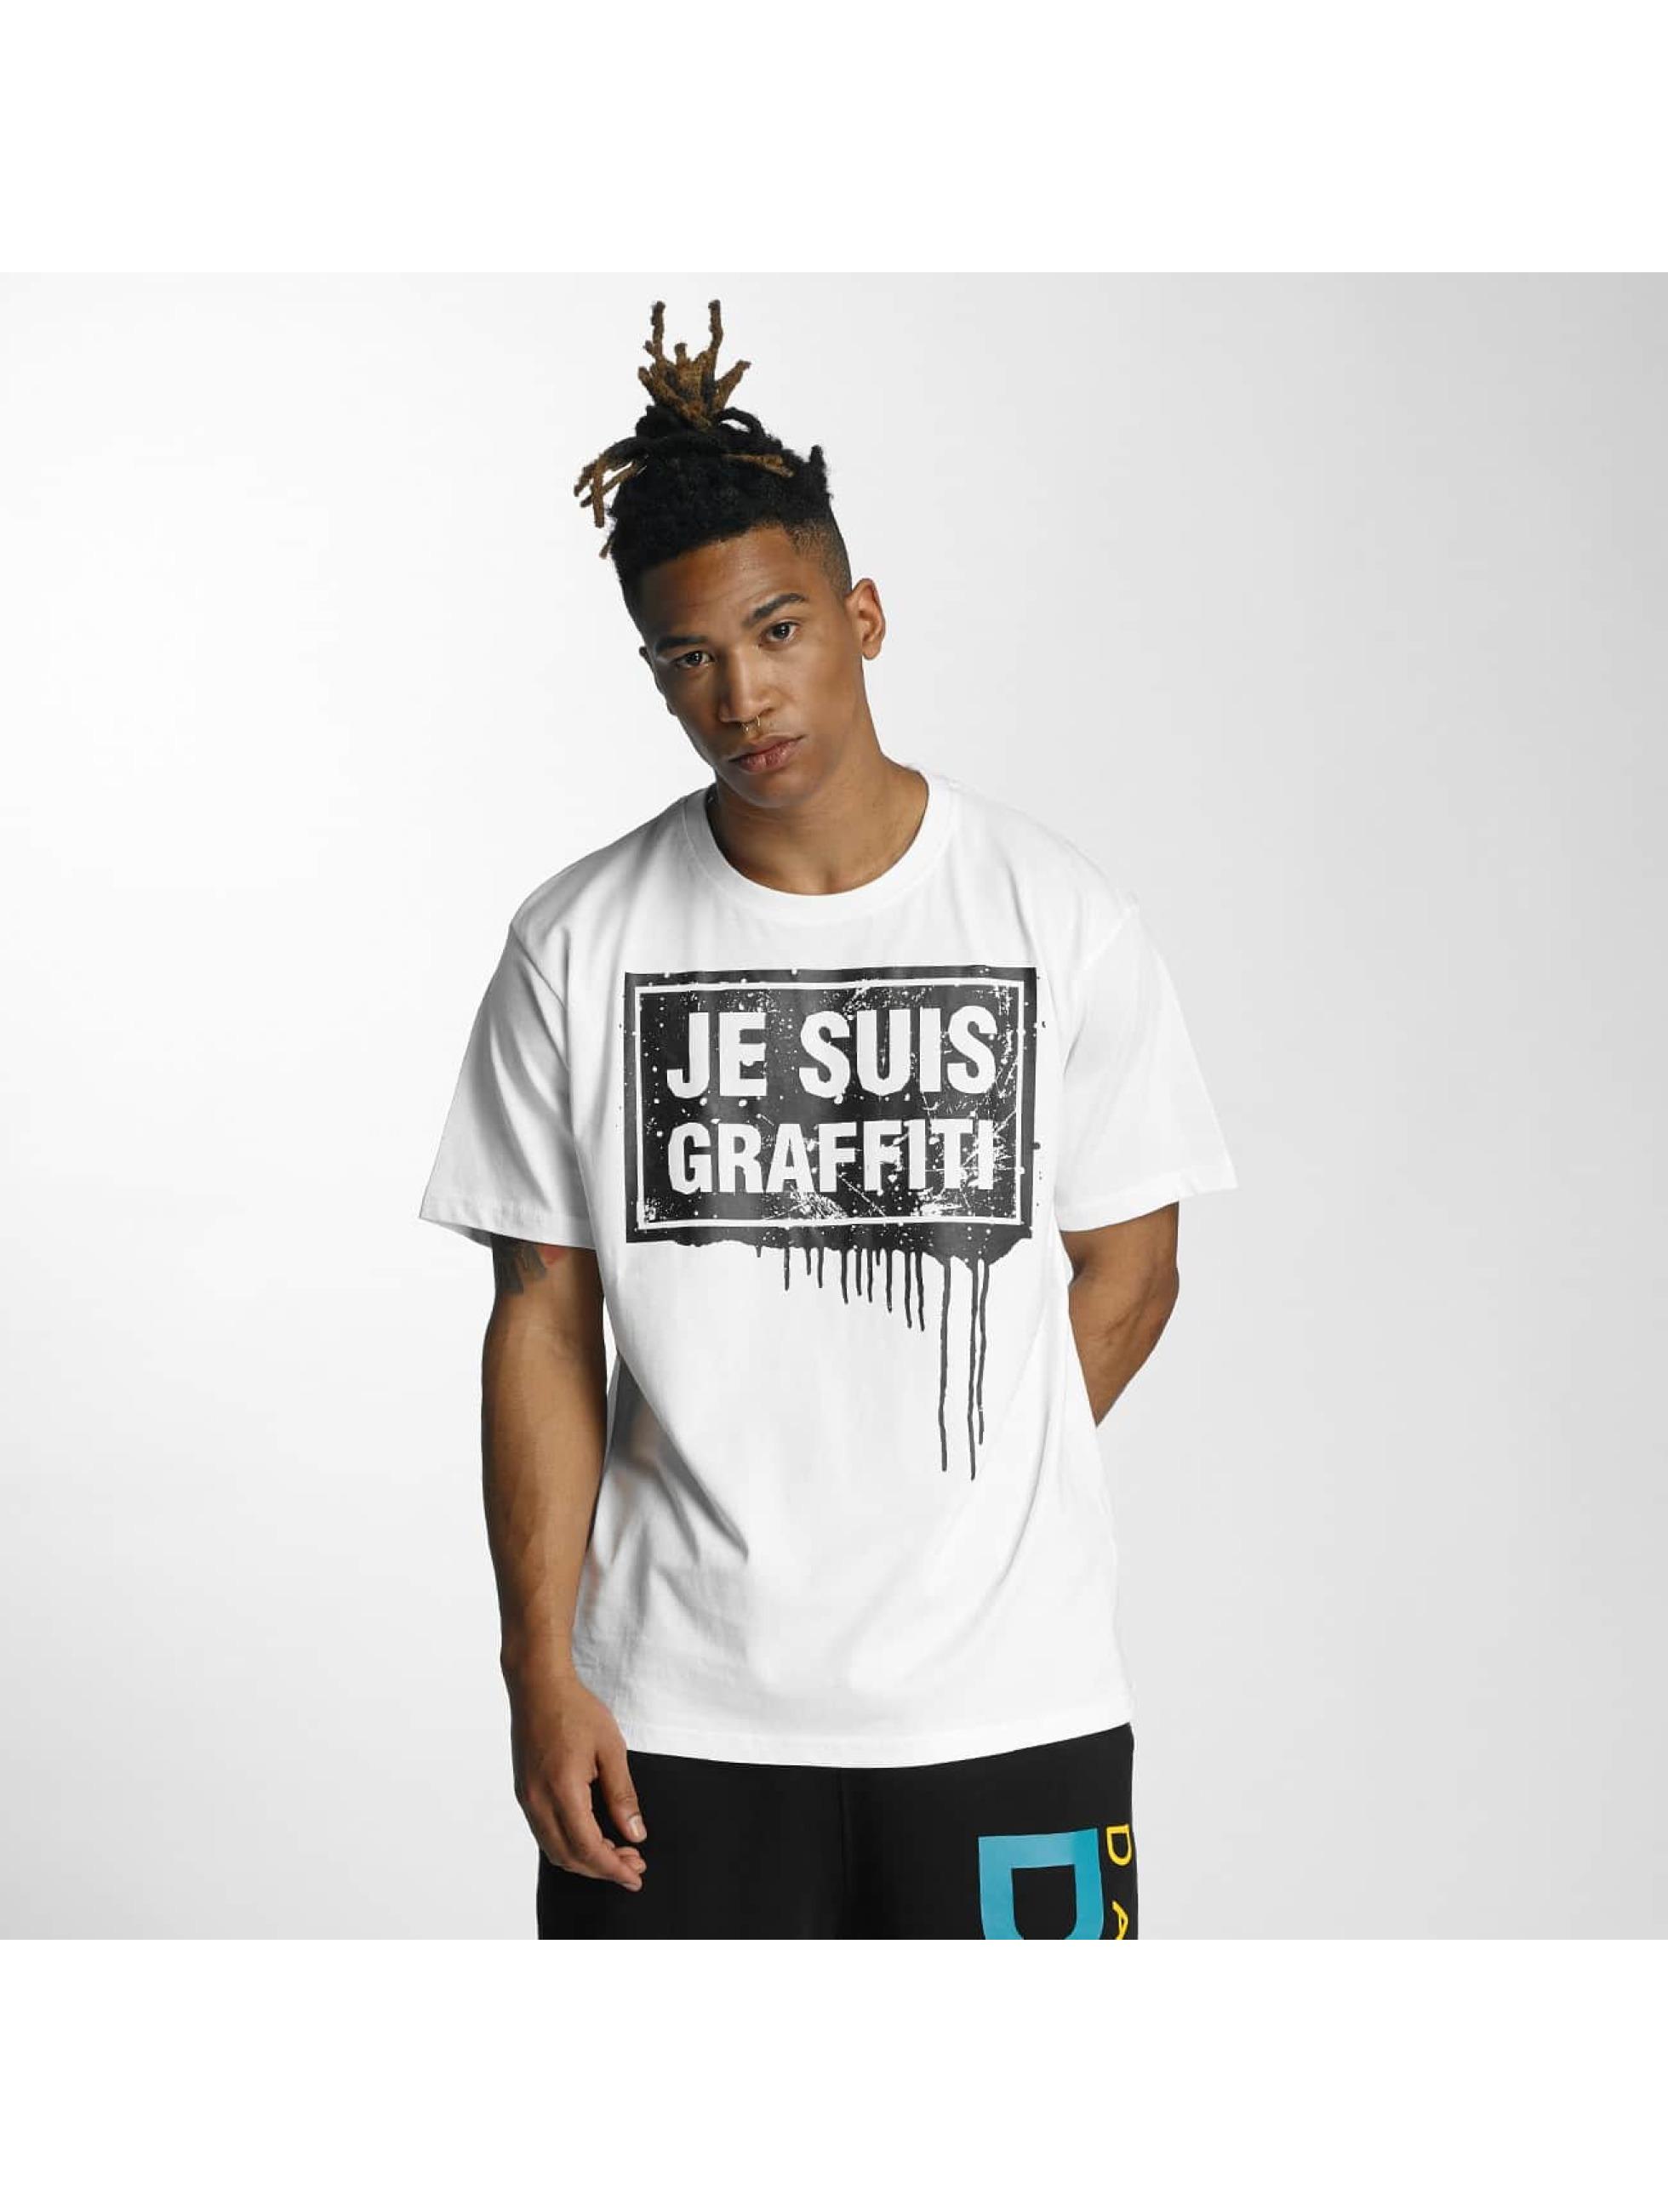 Dangerous-DNGRS-Uomini-Maglieria-T-shirt-Je-Suis-Graffiti